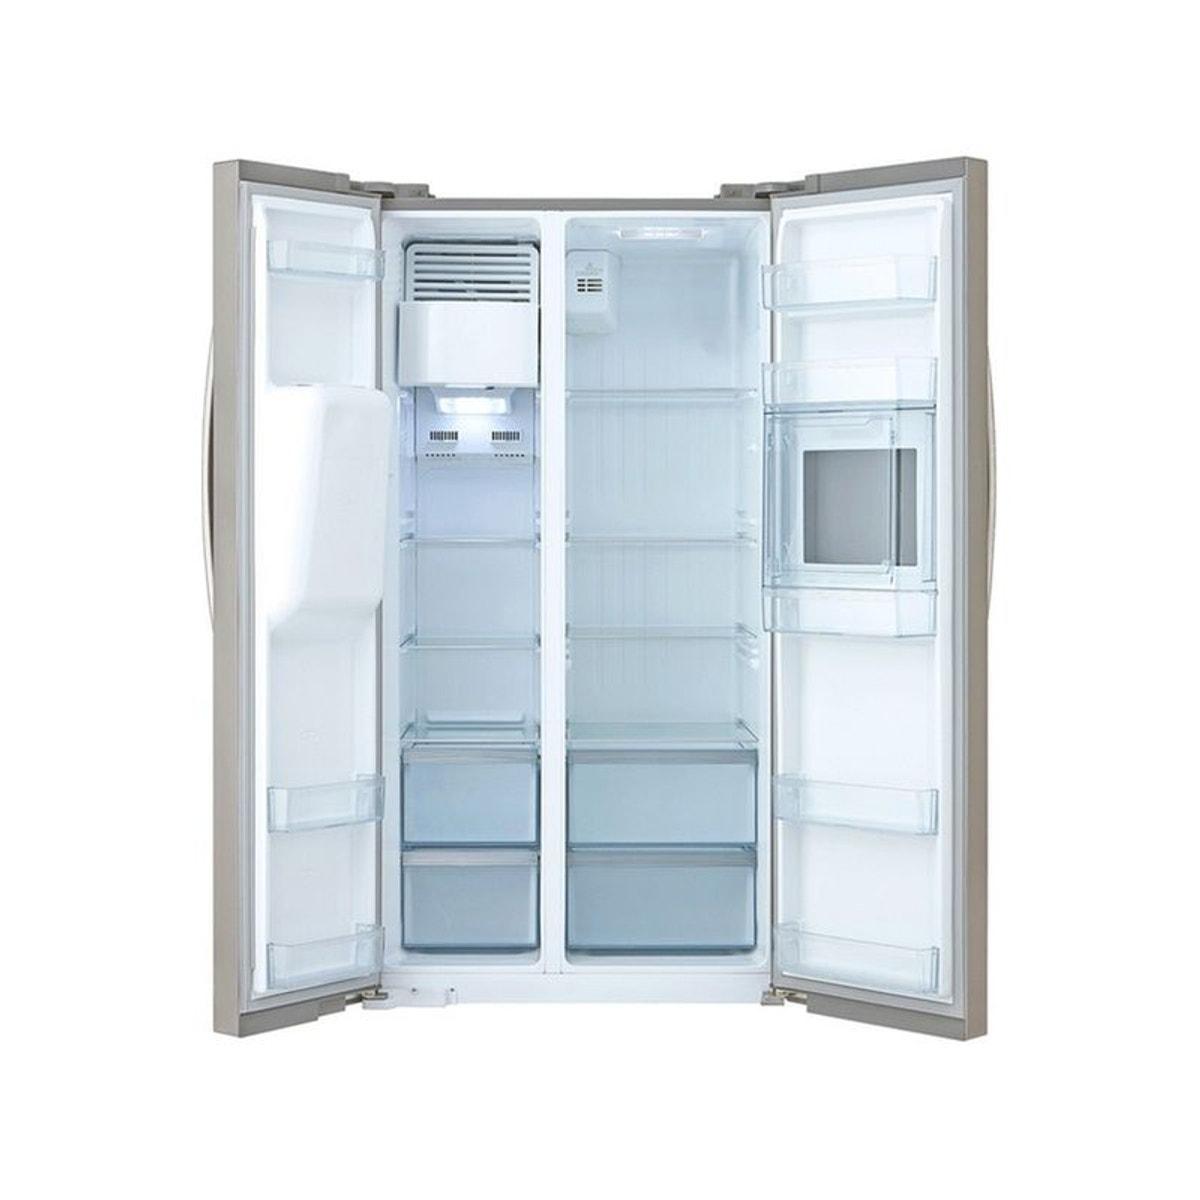 Refrigerateur Americain Frn M570f2x Taille Taille Unique Refrigerateur Americain Grand Refrigerateur Et Frigo Americain